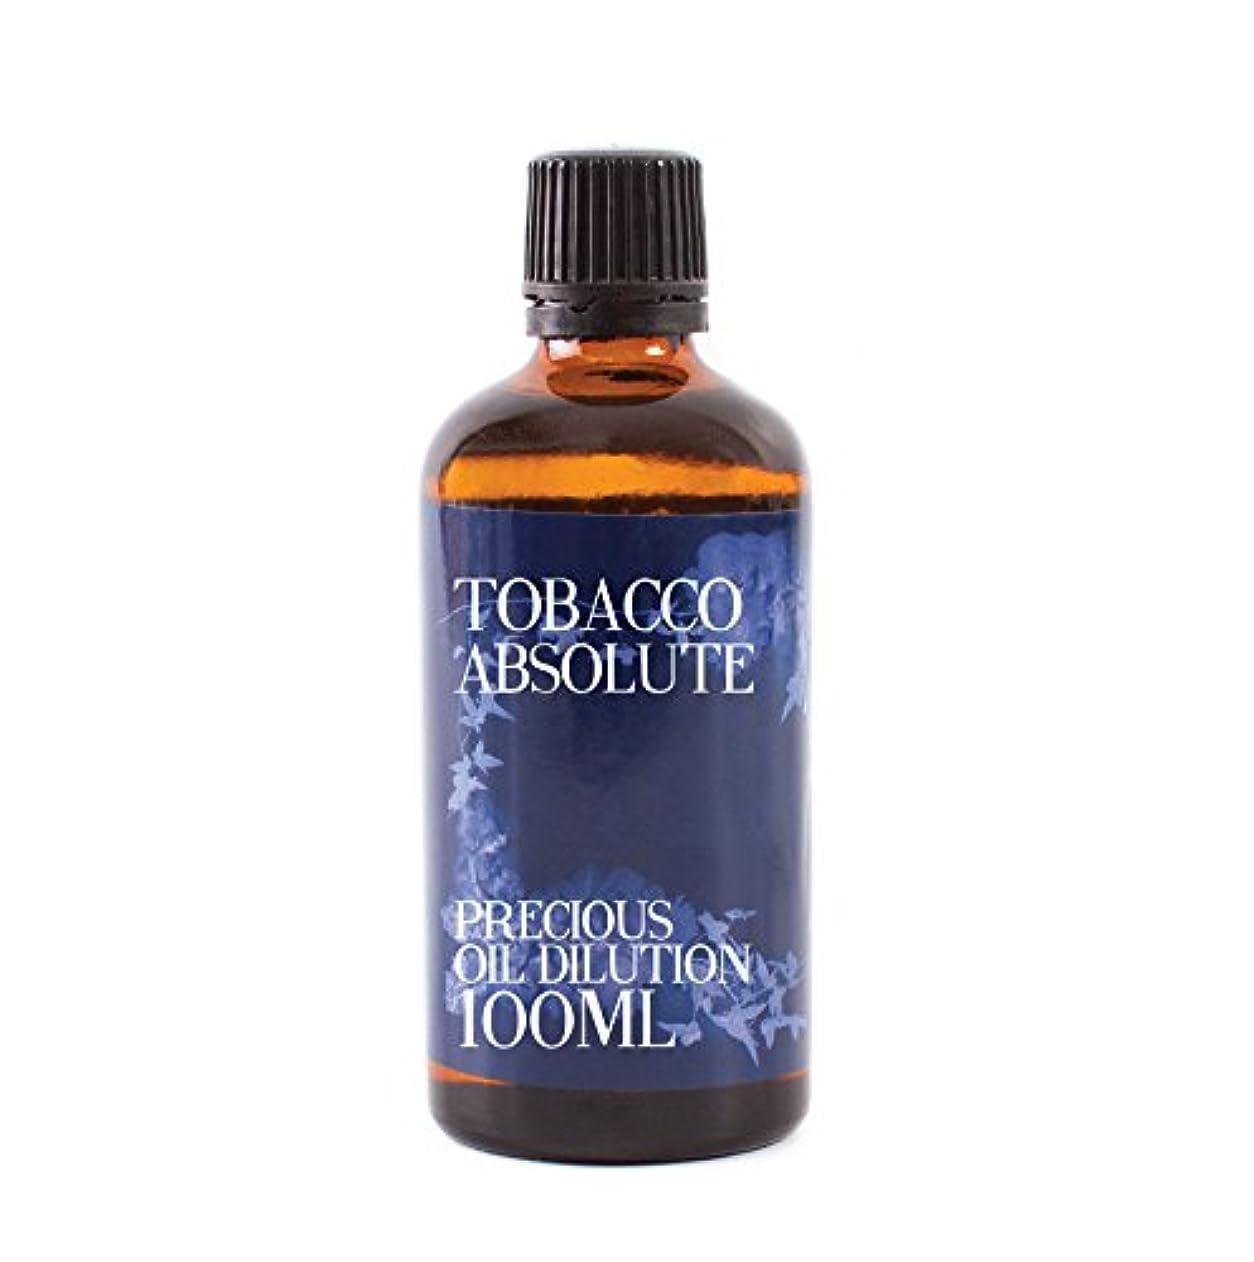 悪行時代障害Tobacco Absolute Oil Dilution - 100ml